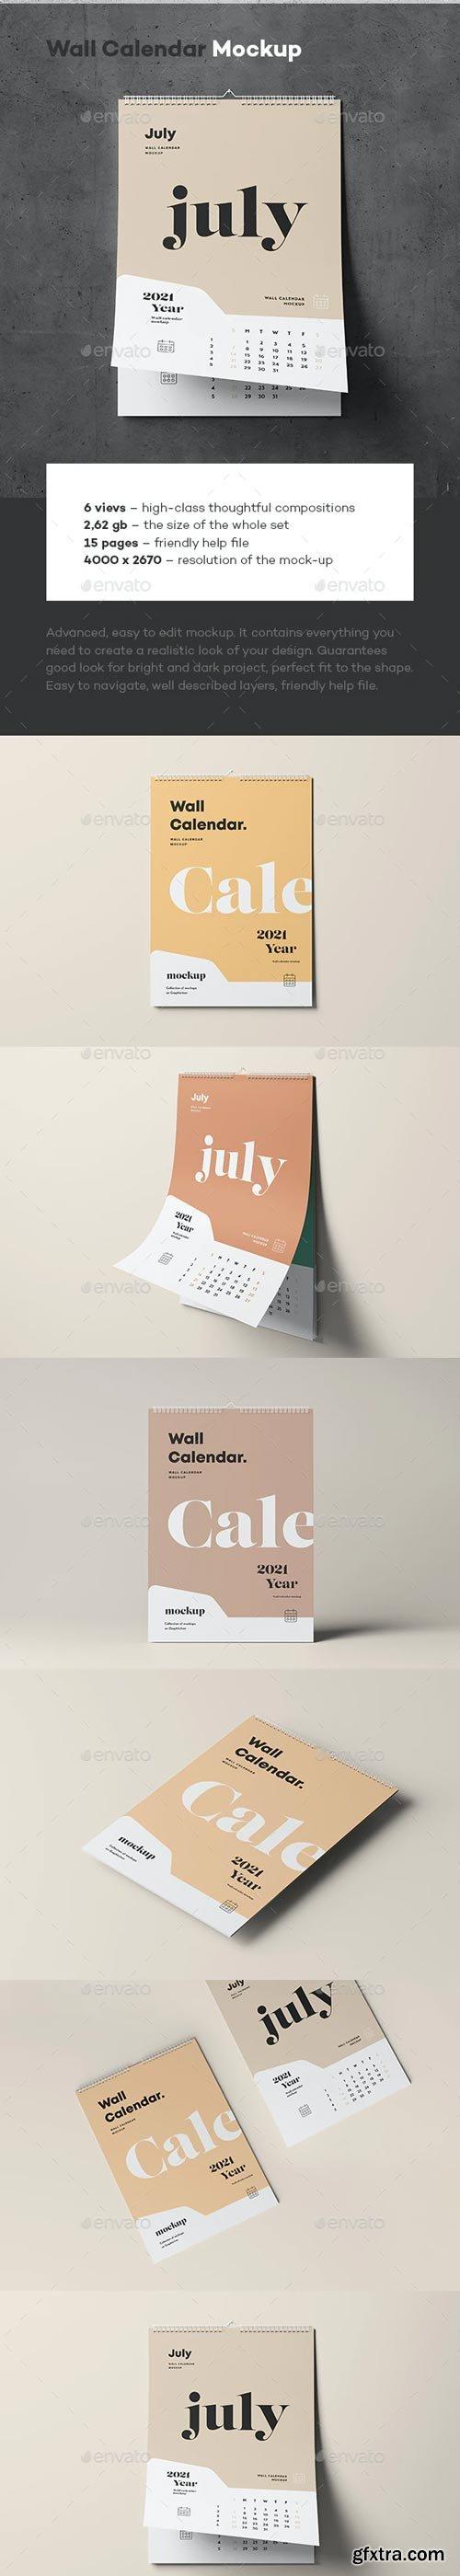 GraphicRiver - Wall Calendar Mock-up - 29436808